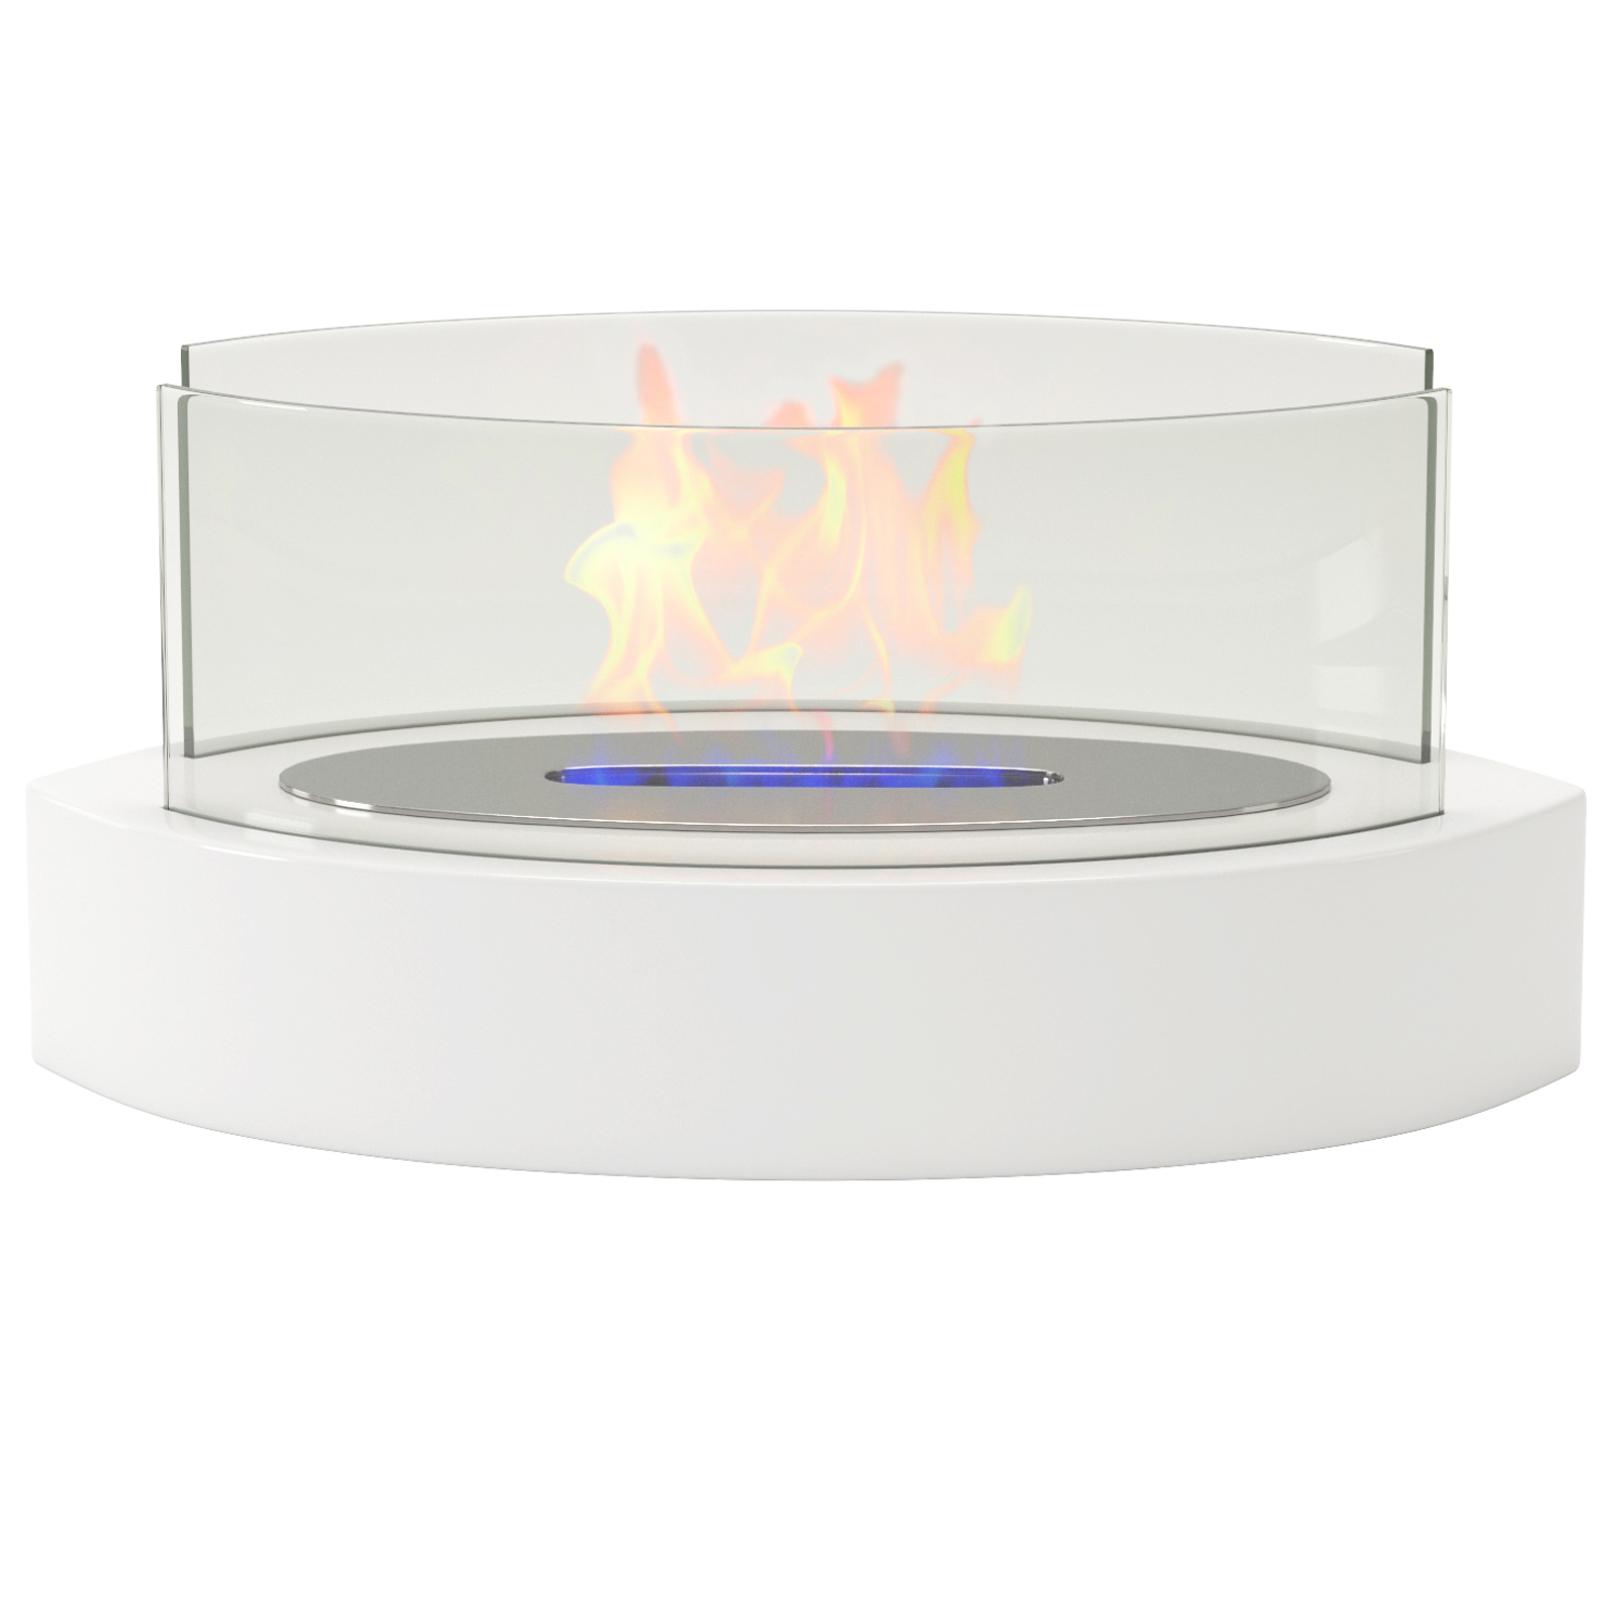 Festnight Tabletop Fireplace Ventless Bio Ethanol Fireplace Indoor